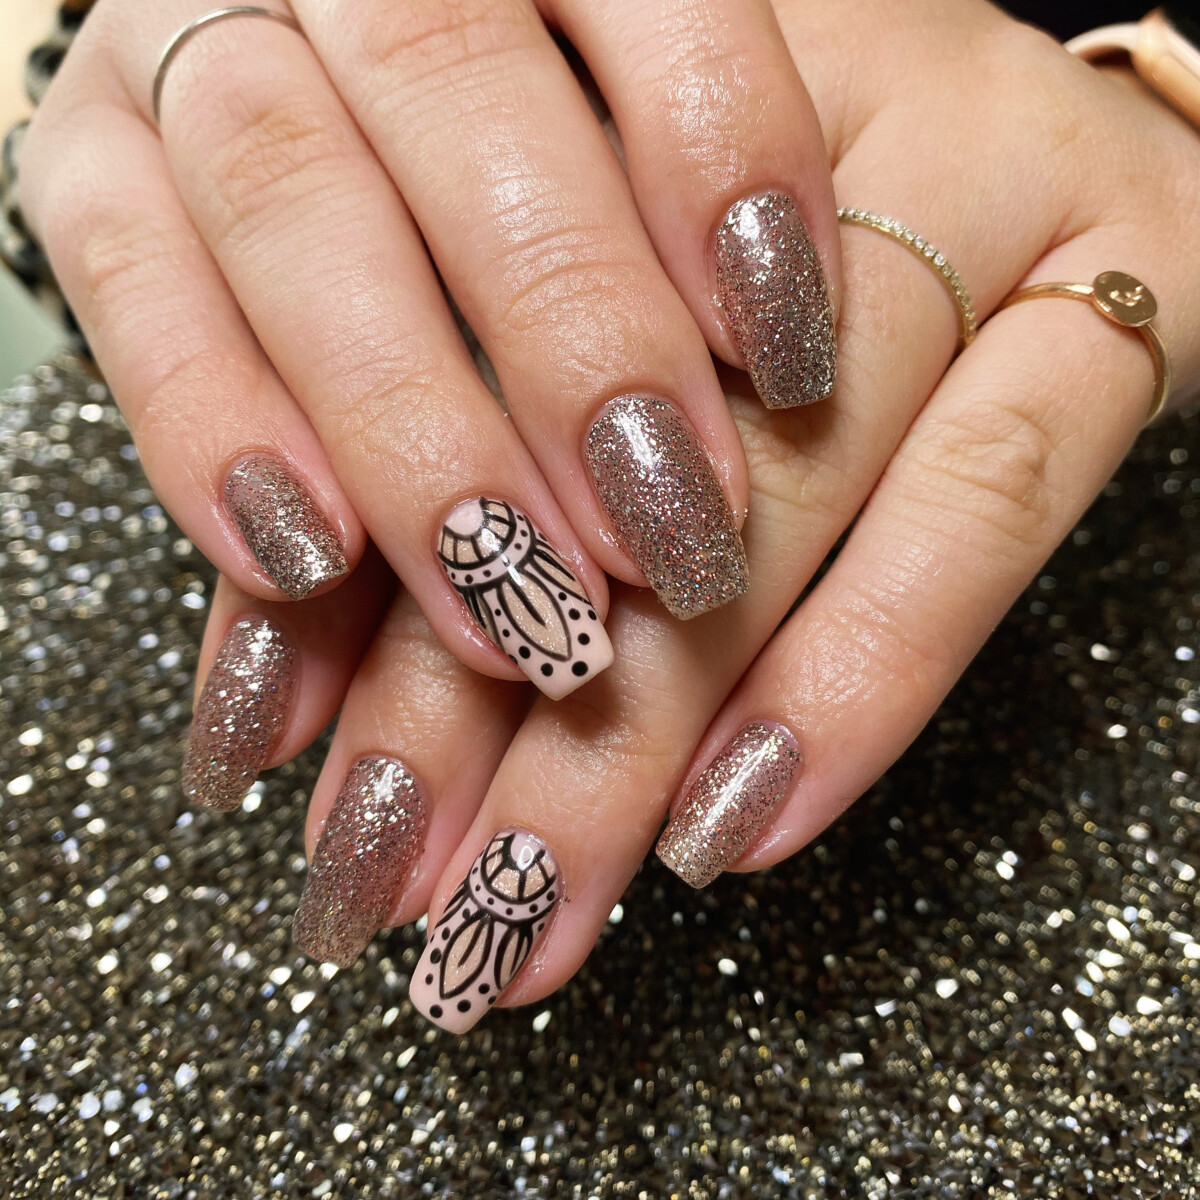 Manicure extra + nail art premium